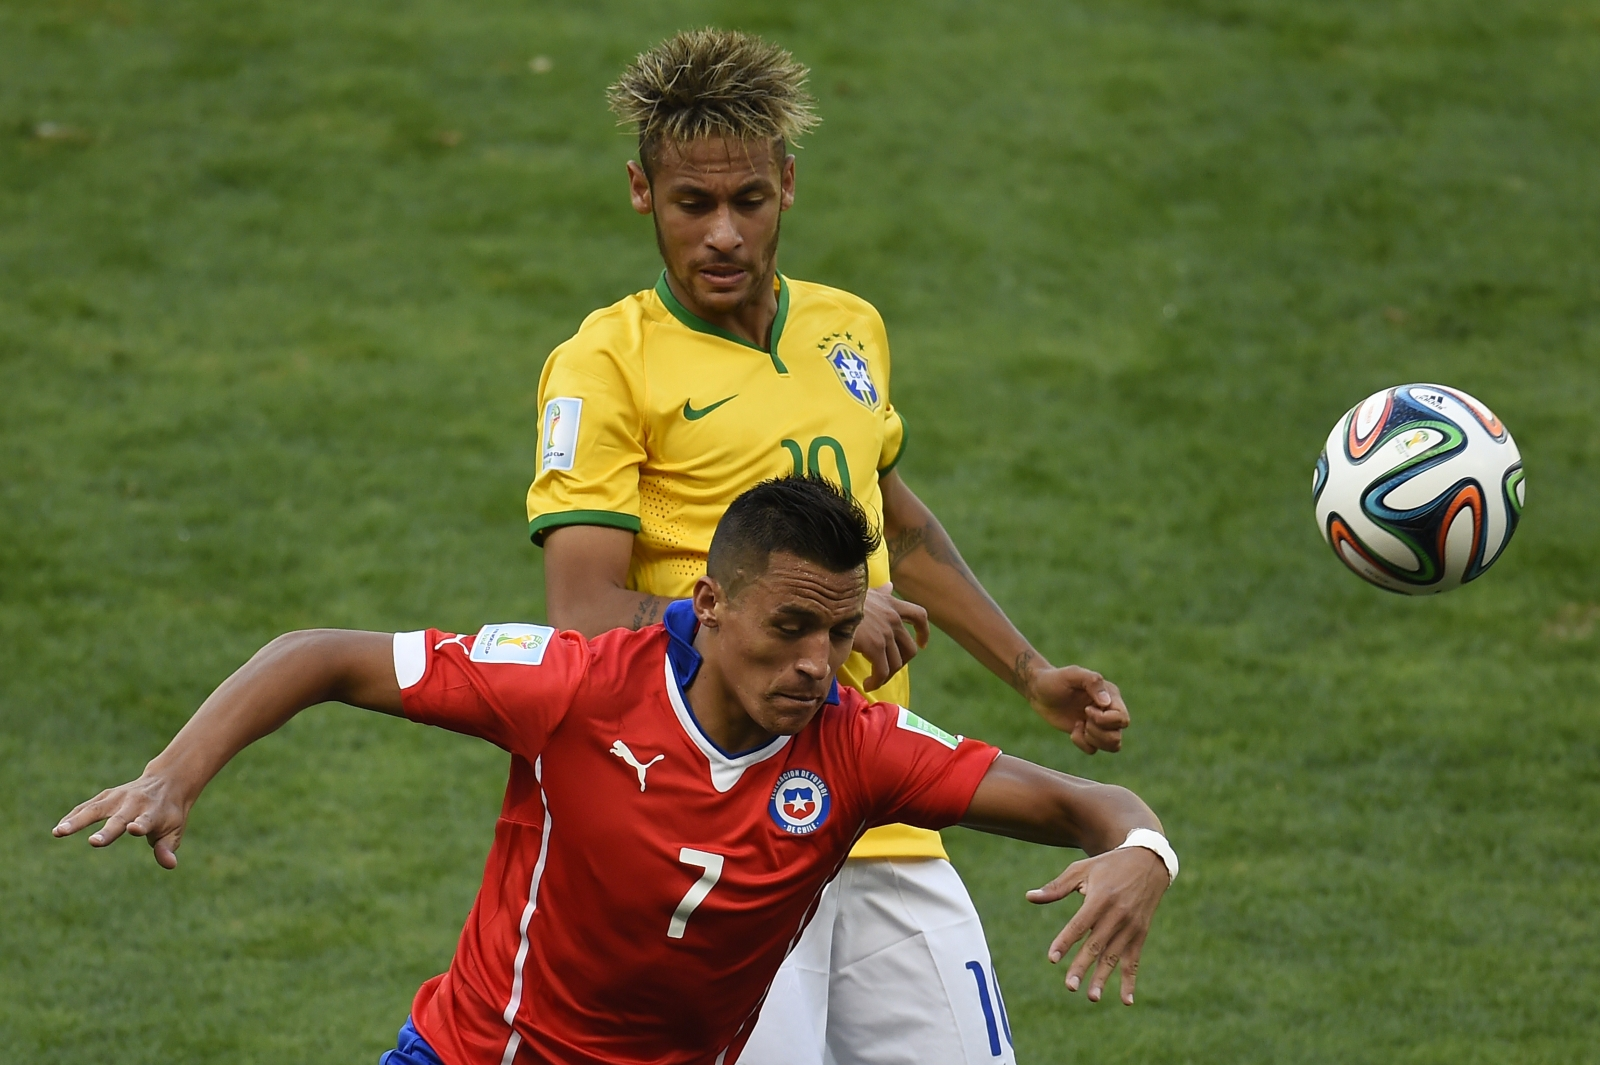 Alexis and Neymar